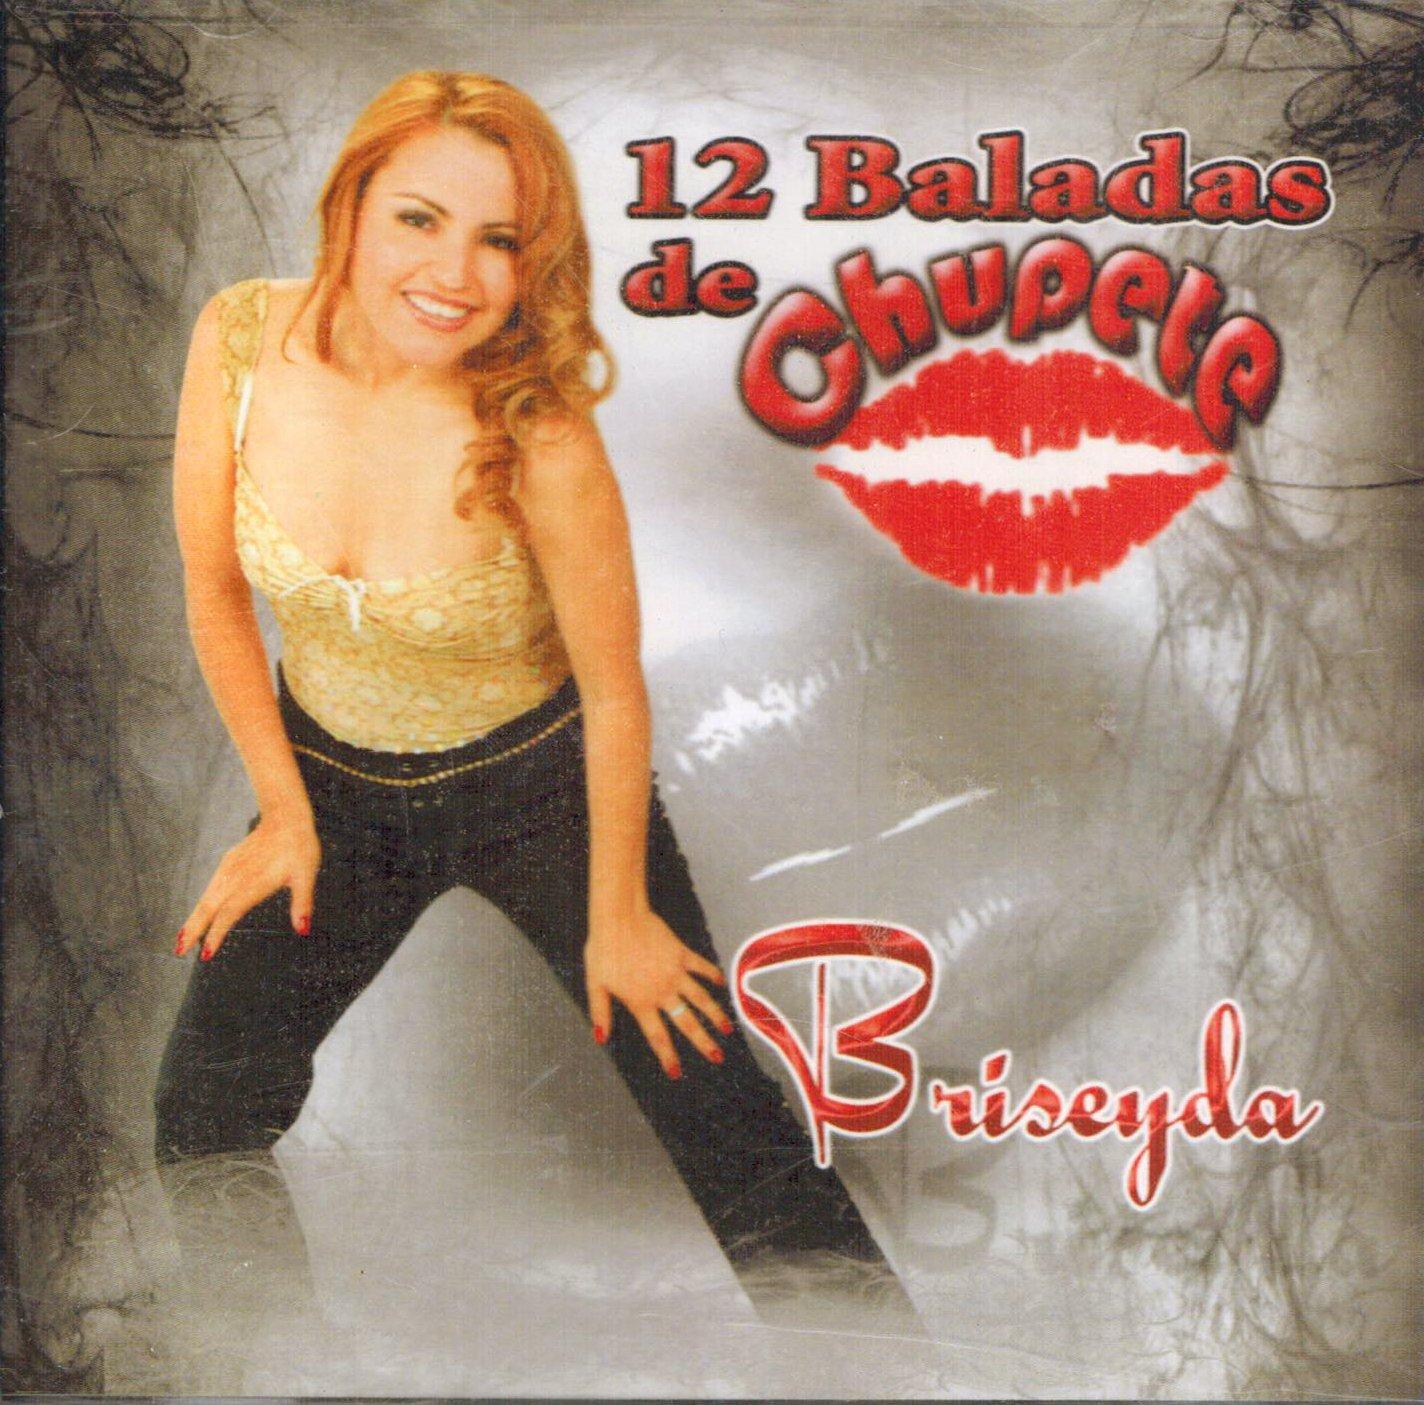 Briseyda - Briseyda (12 Baladas de Chupete Fonovisa-385022) - Amazon ...